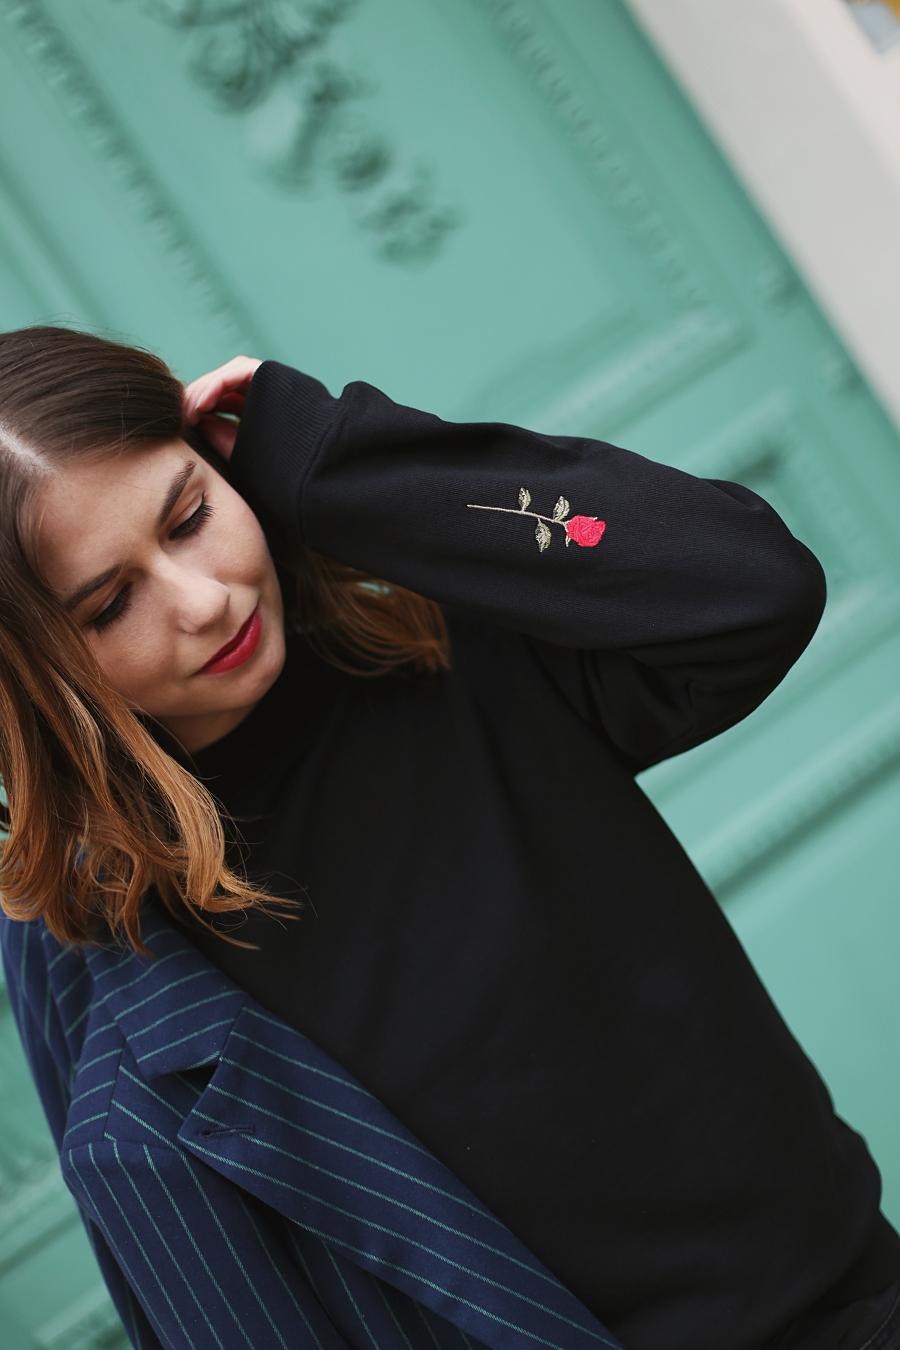 Fokus na detal: haftowane róże na rękawach